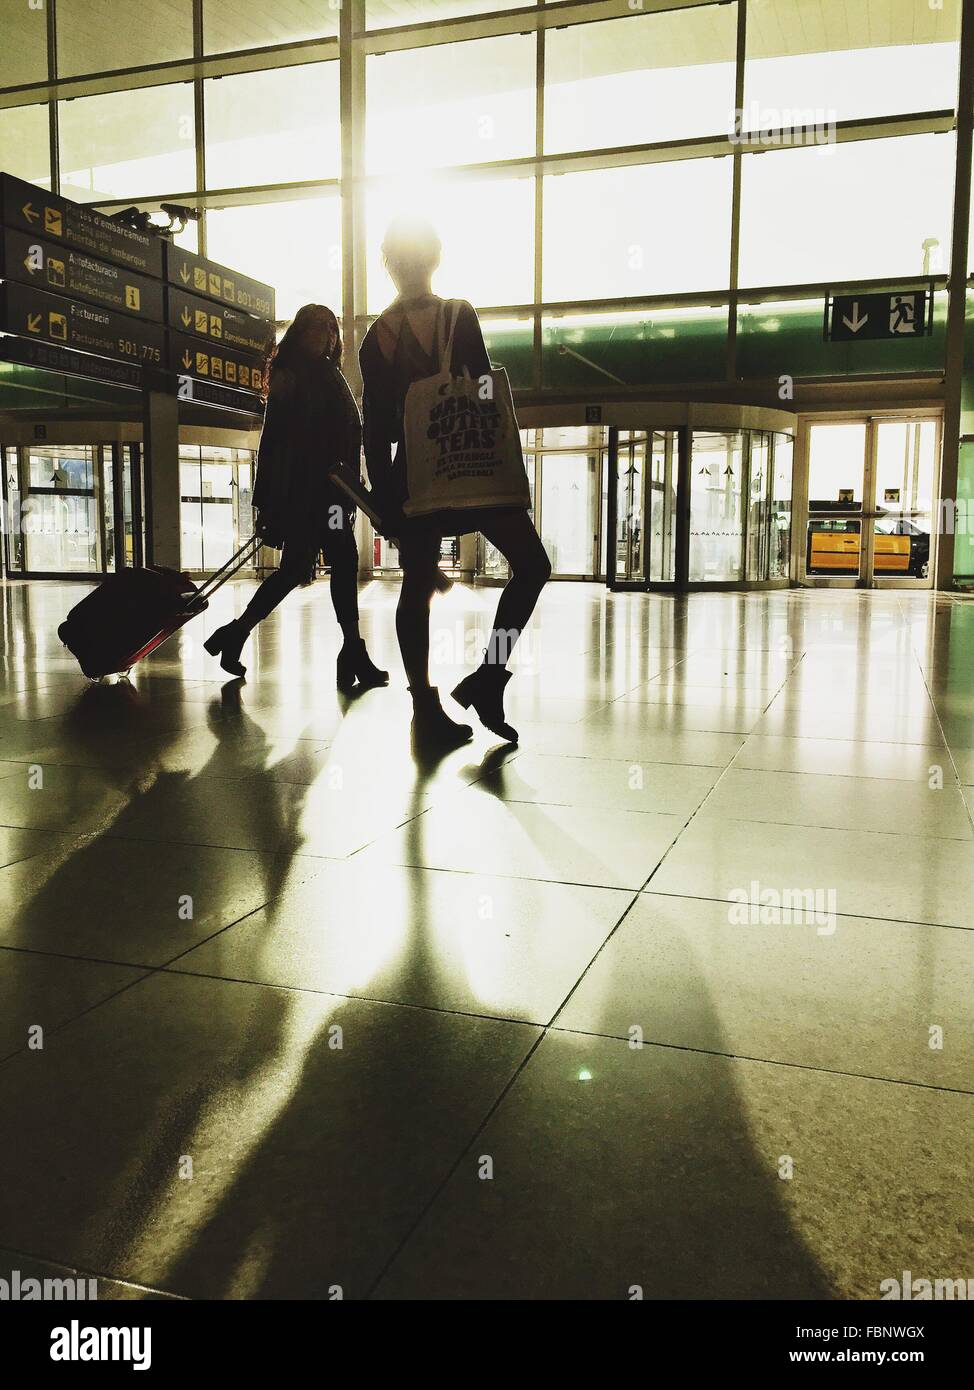 Schatten der Frauen Stock am Flughafen Stockbild